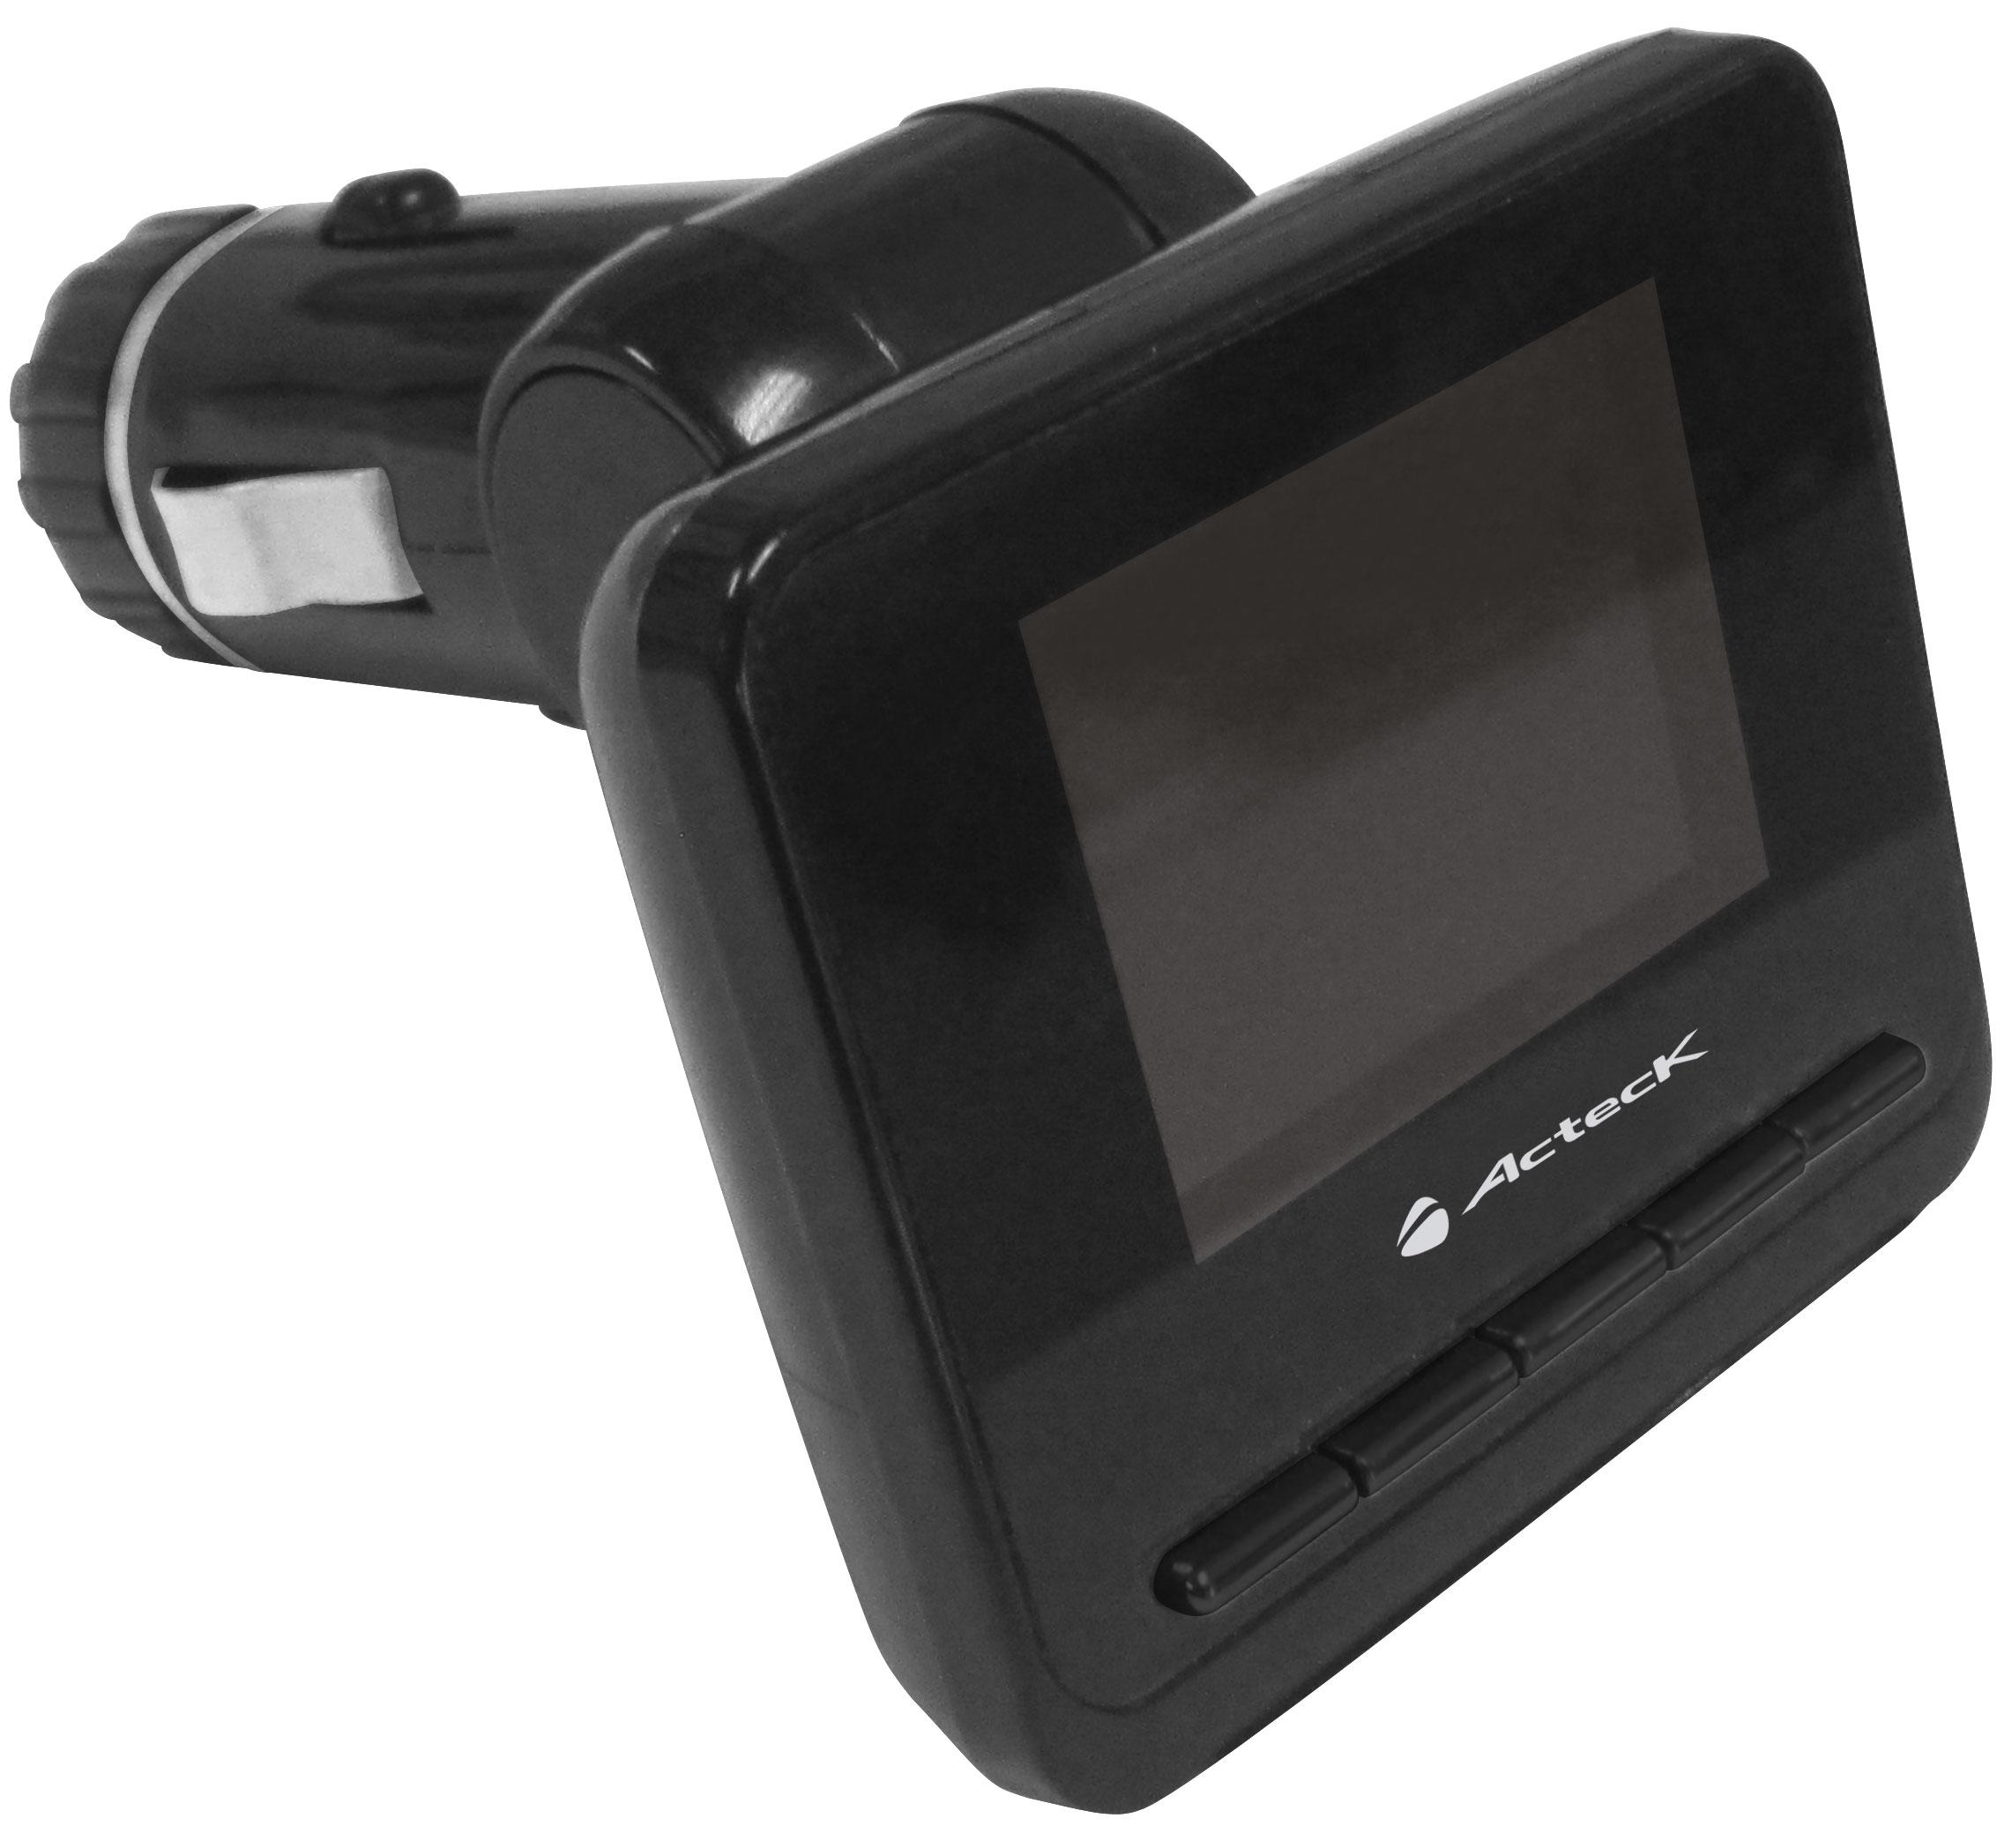 Acteck presenta nuevo transmisor de FM/SD/USB, su nuevo Transbit TF-450